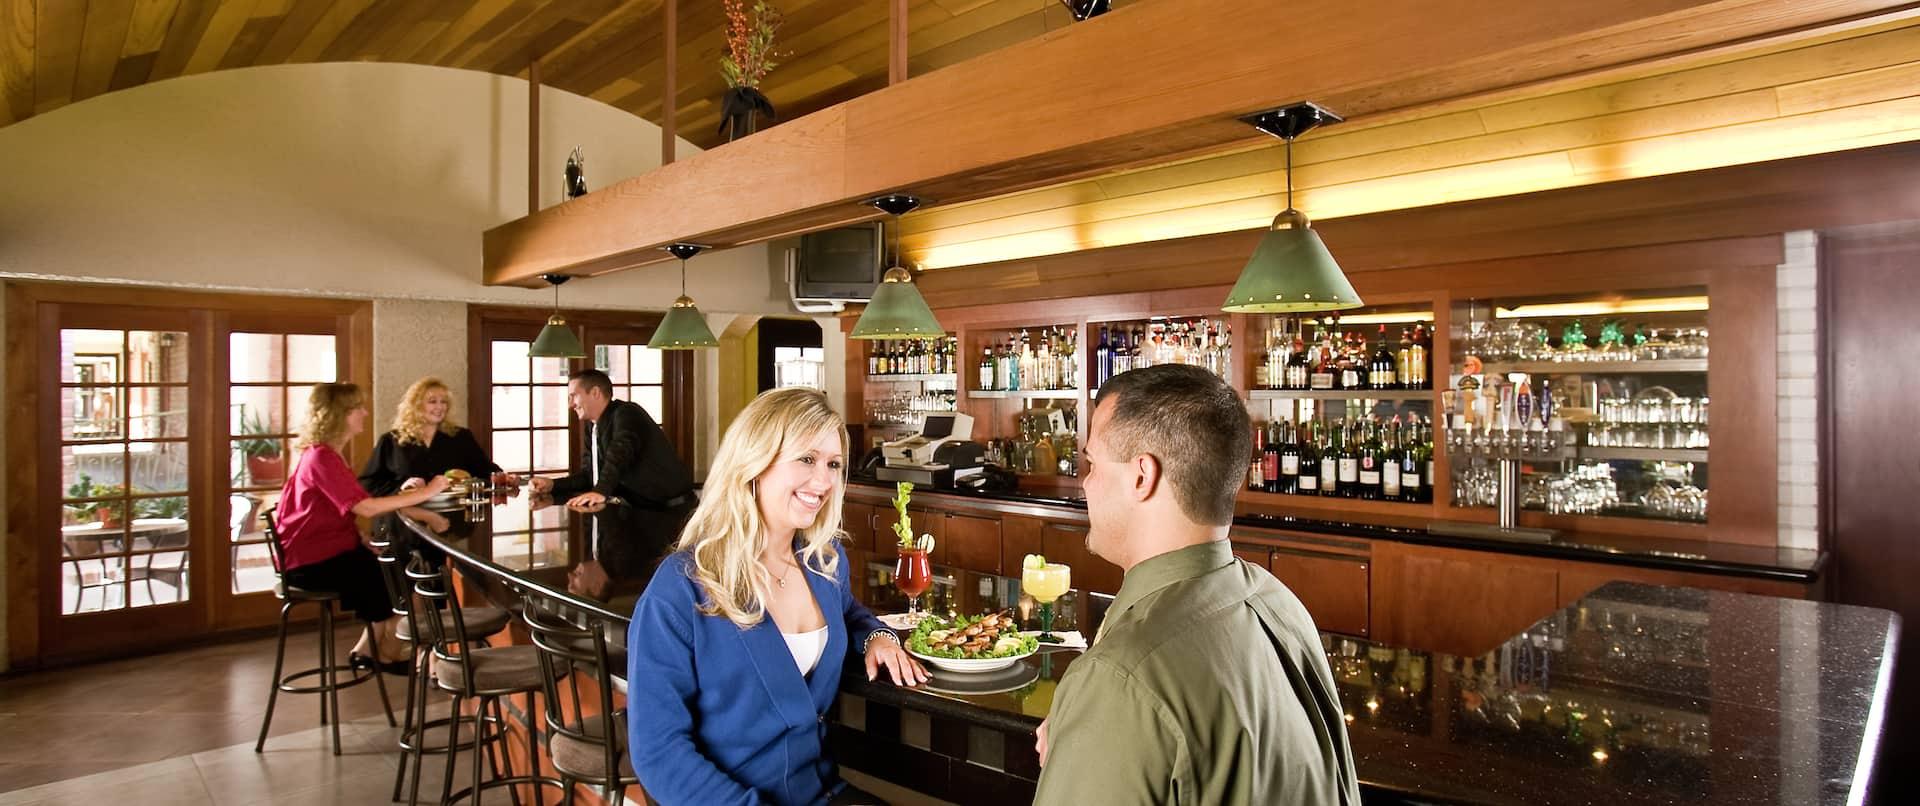 Finnegan's Restaurant and Lounge